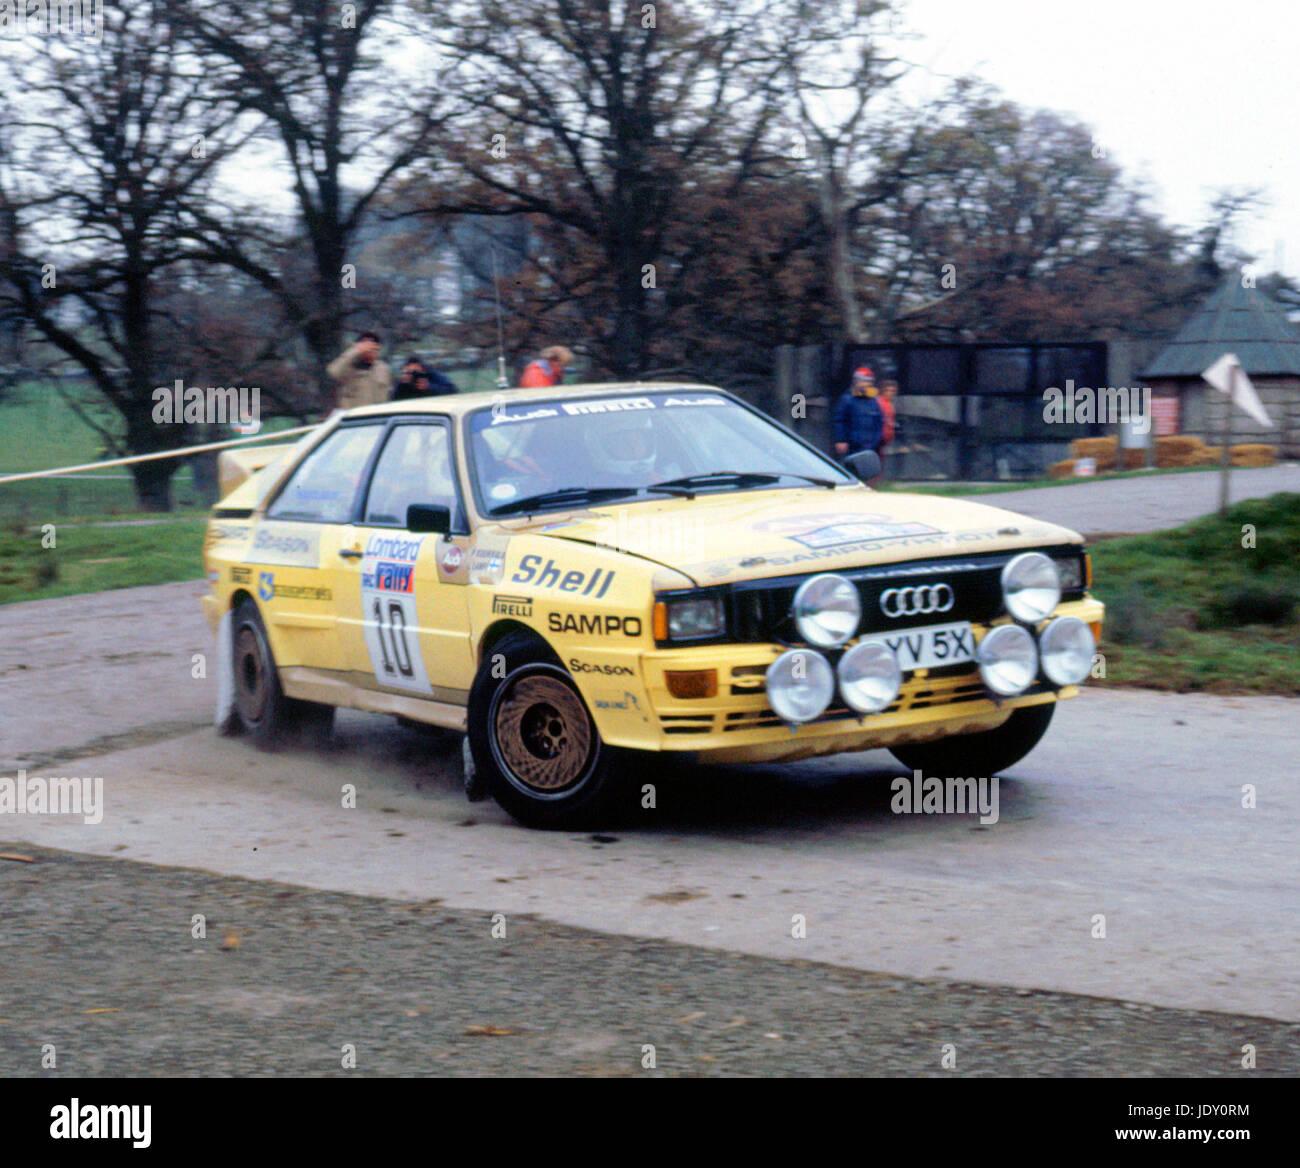 Audi Quattro A2, Lasse Lampi. 1983 RAC Rally Stock Photo